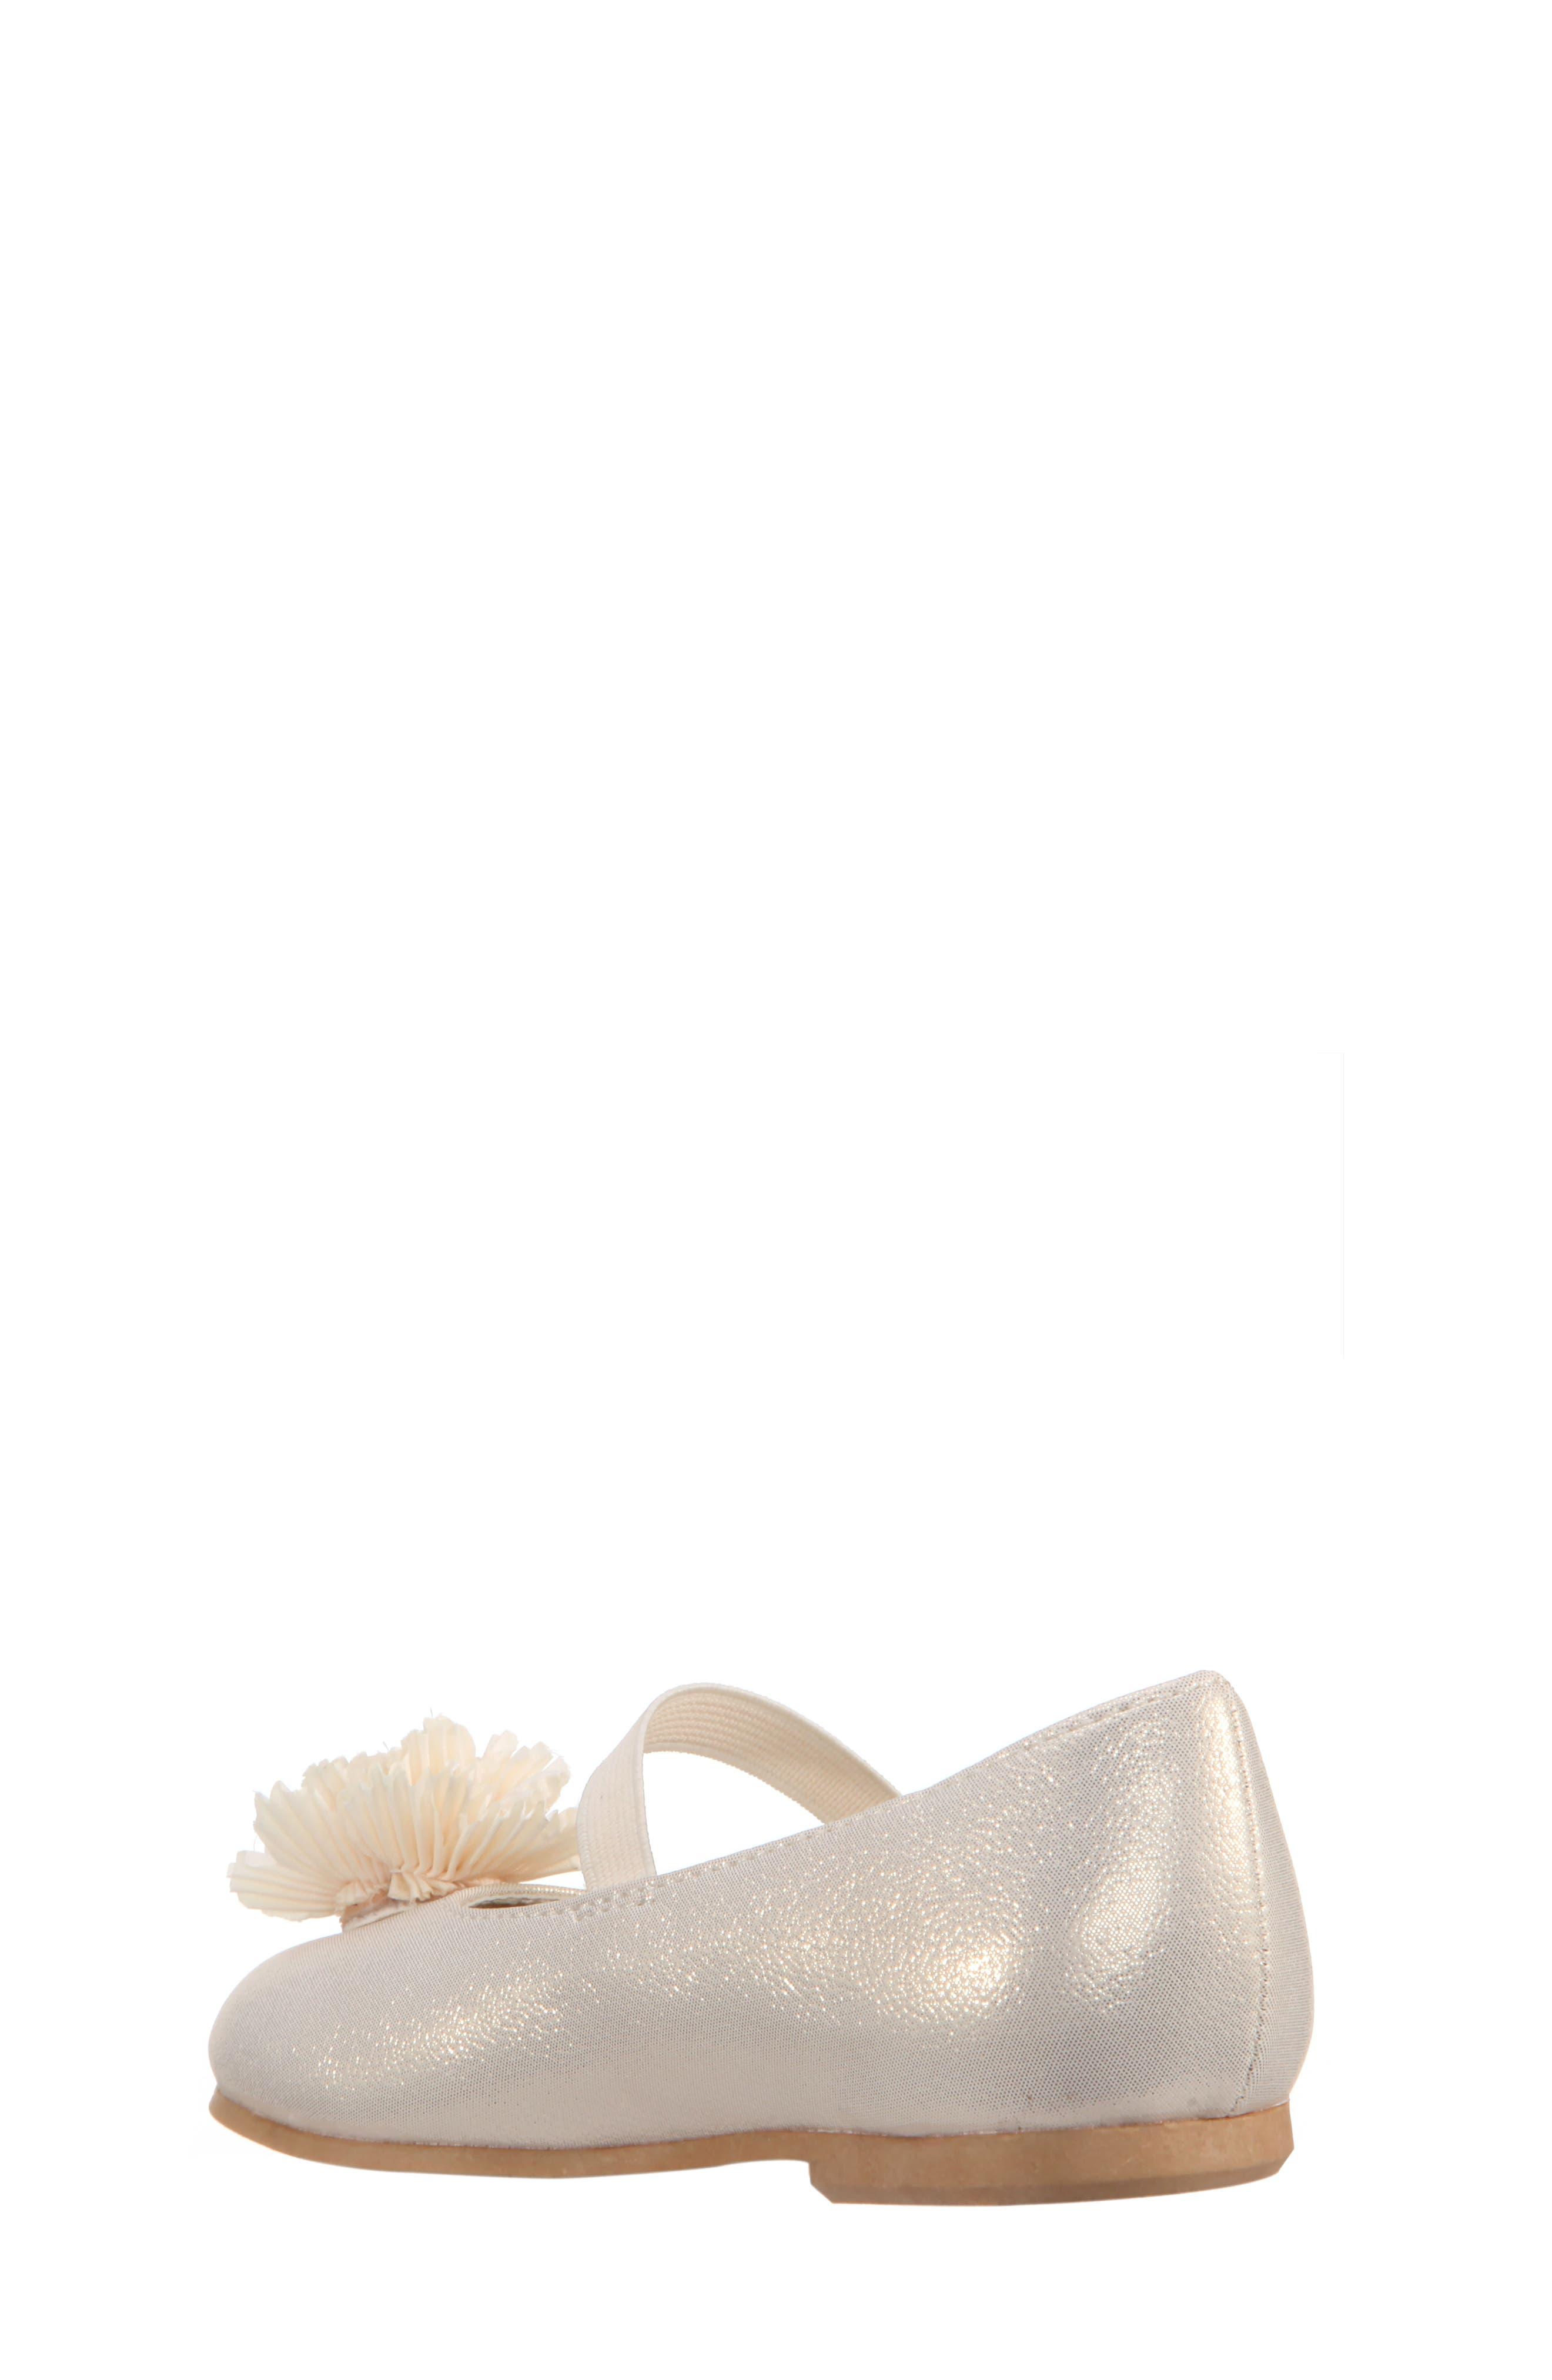 Jemma-T Bow Ballet Flat,                             Alternate thumbnail 2, color,                             040